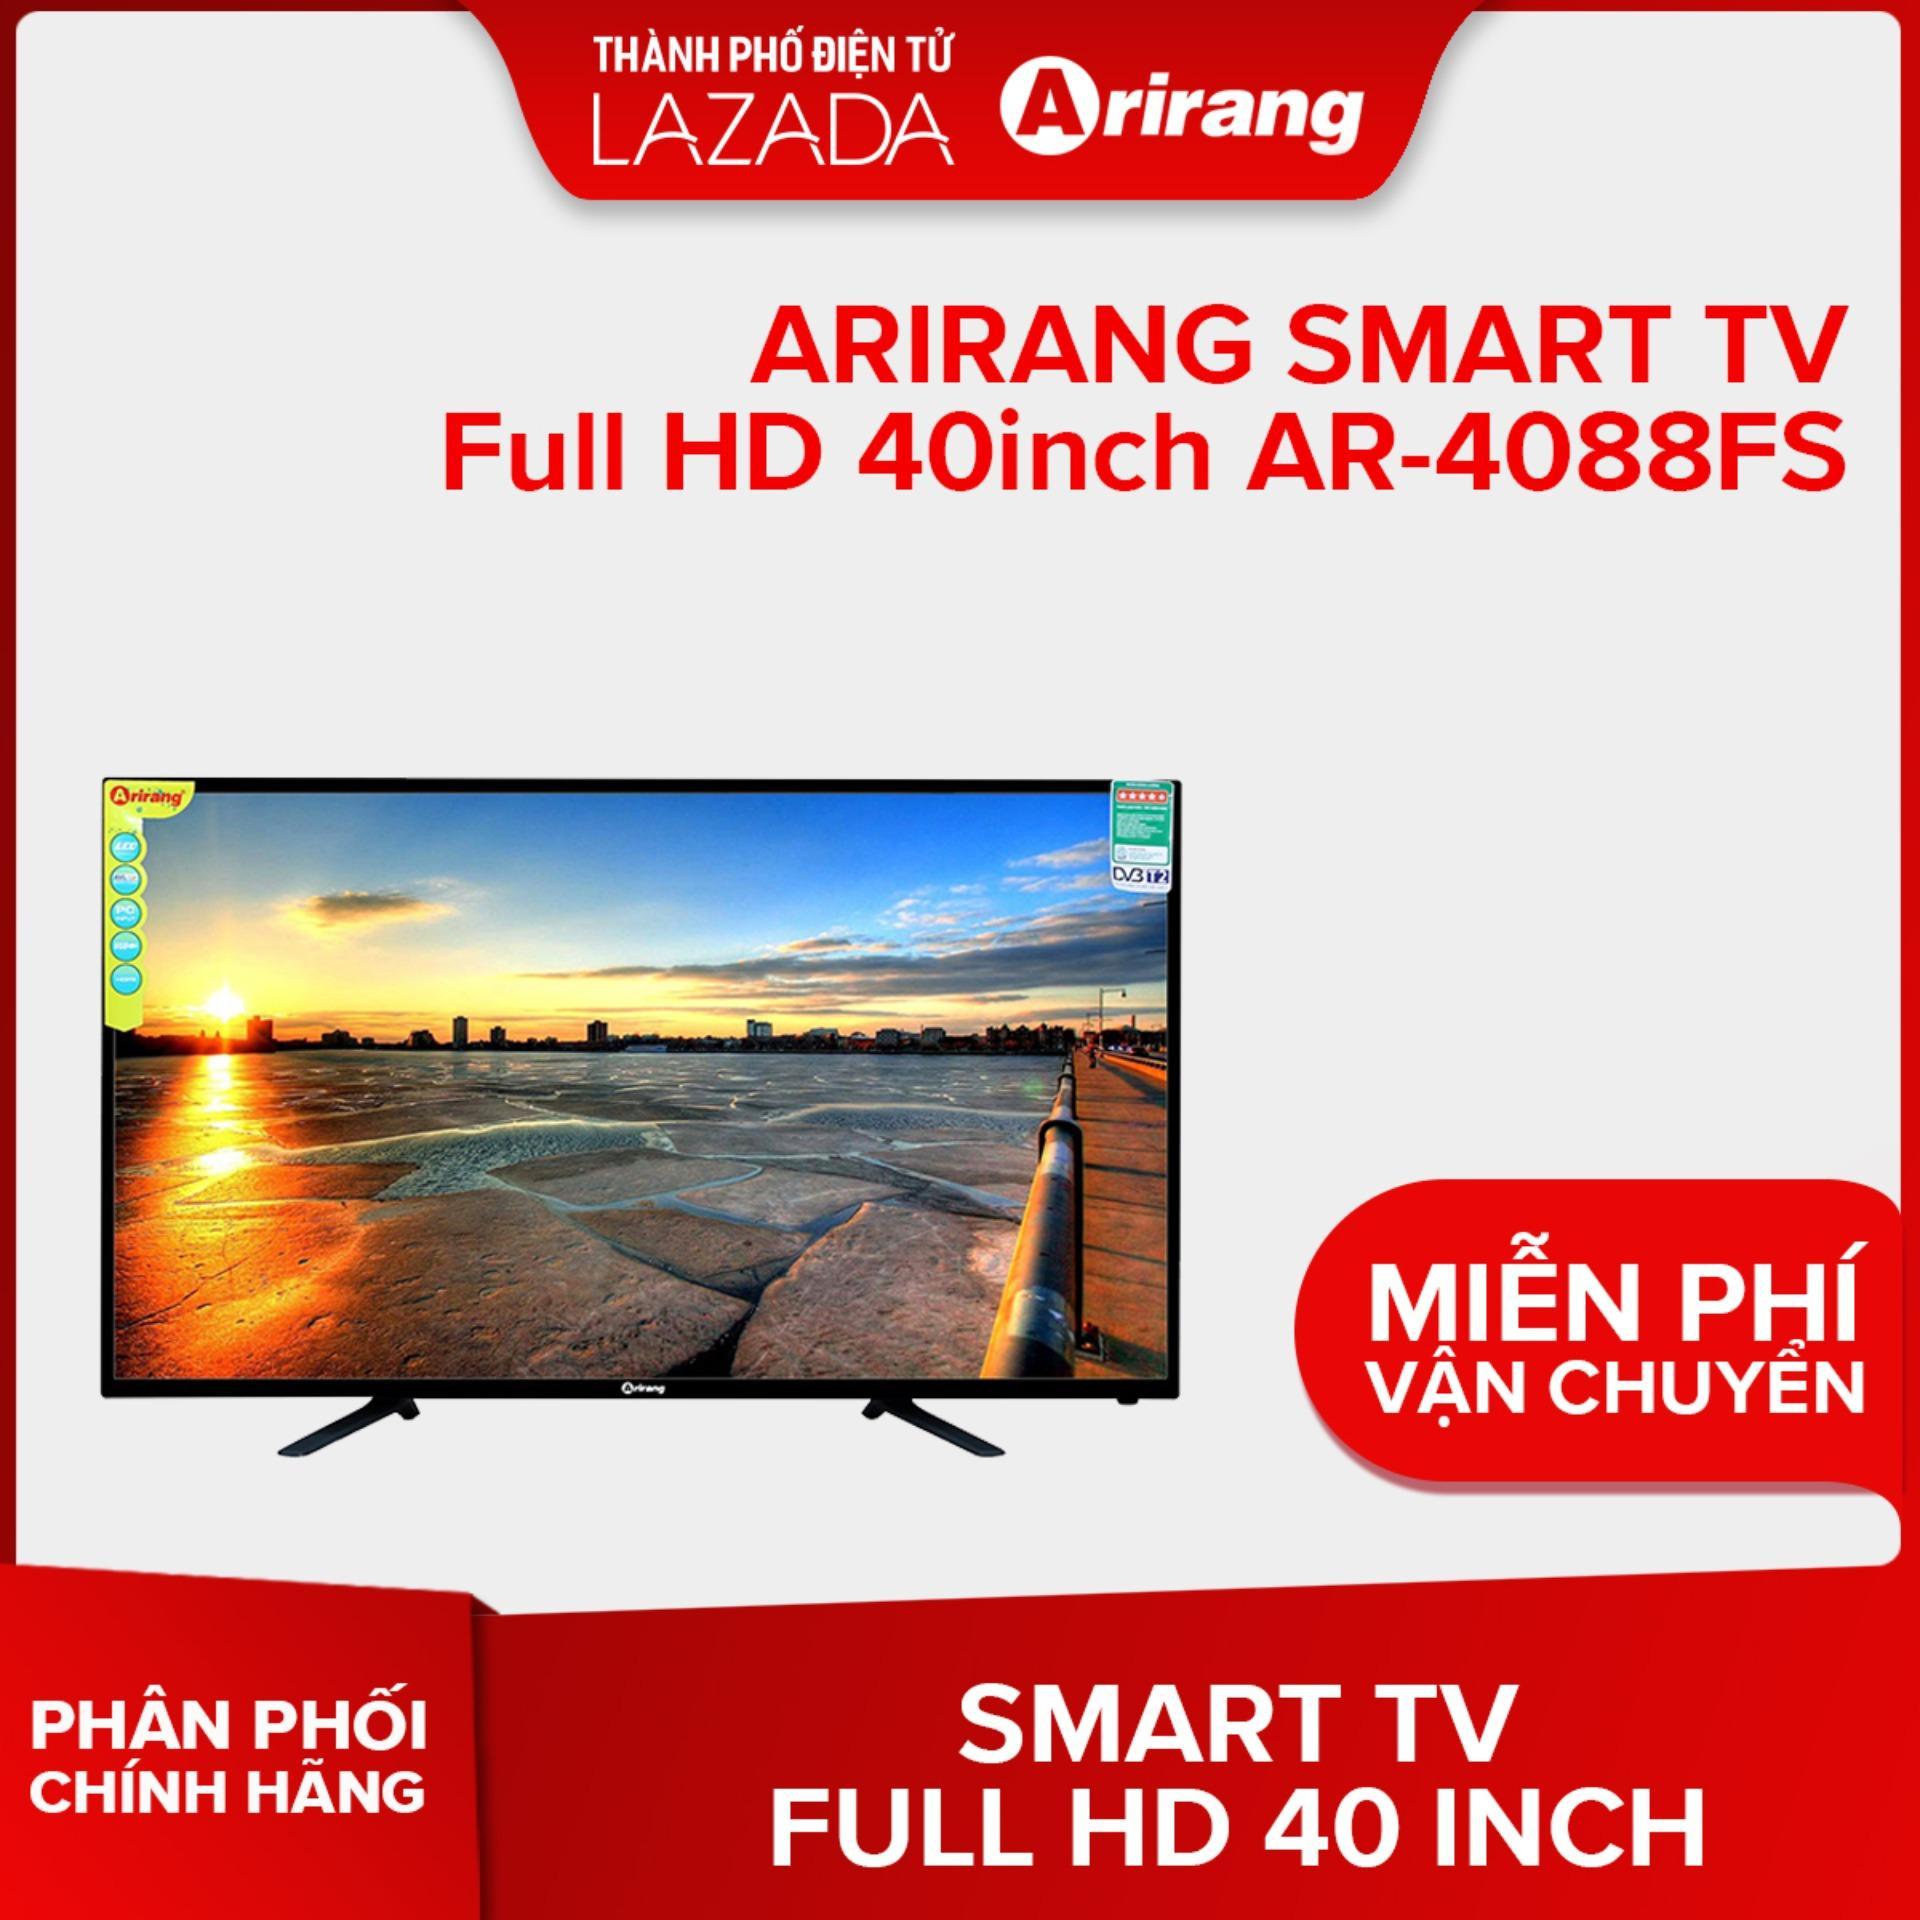 Bảng giá ARIRANG SMART TV FULL HD 40 INCH AR-4088FS